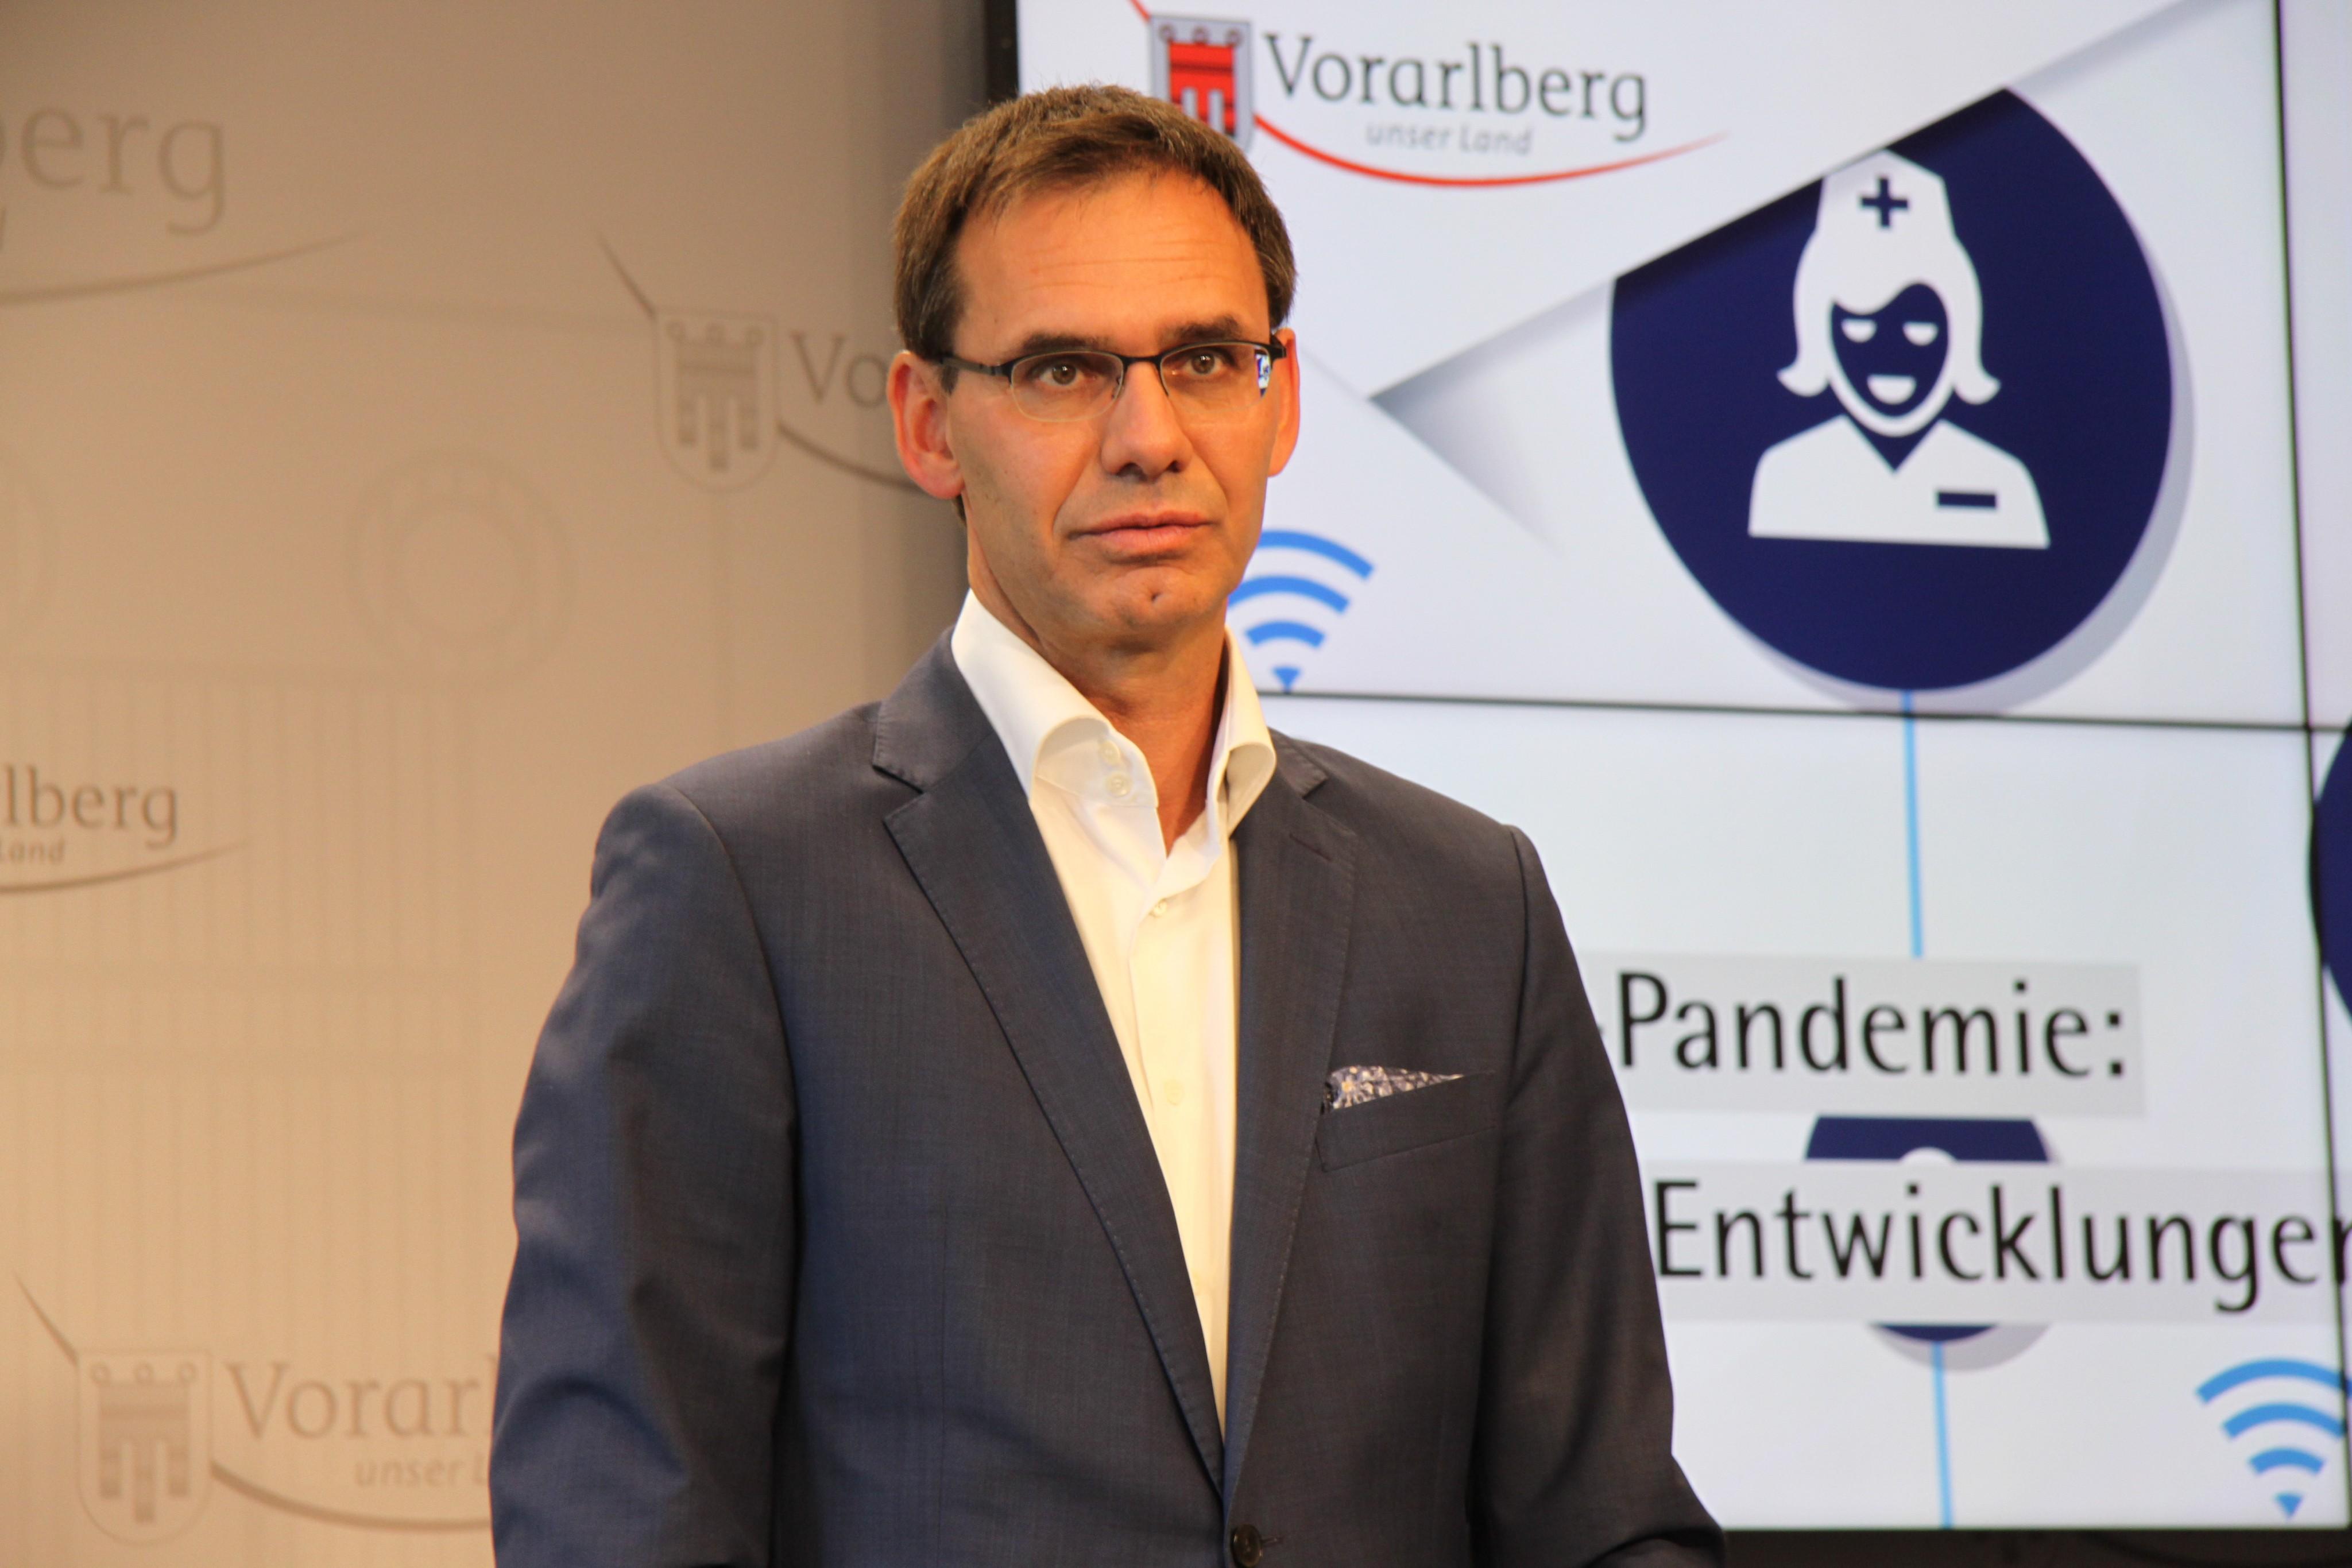 Vorarlberg auf roter Liste Belgiens: So reagiert Wallner